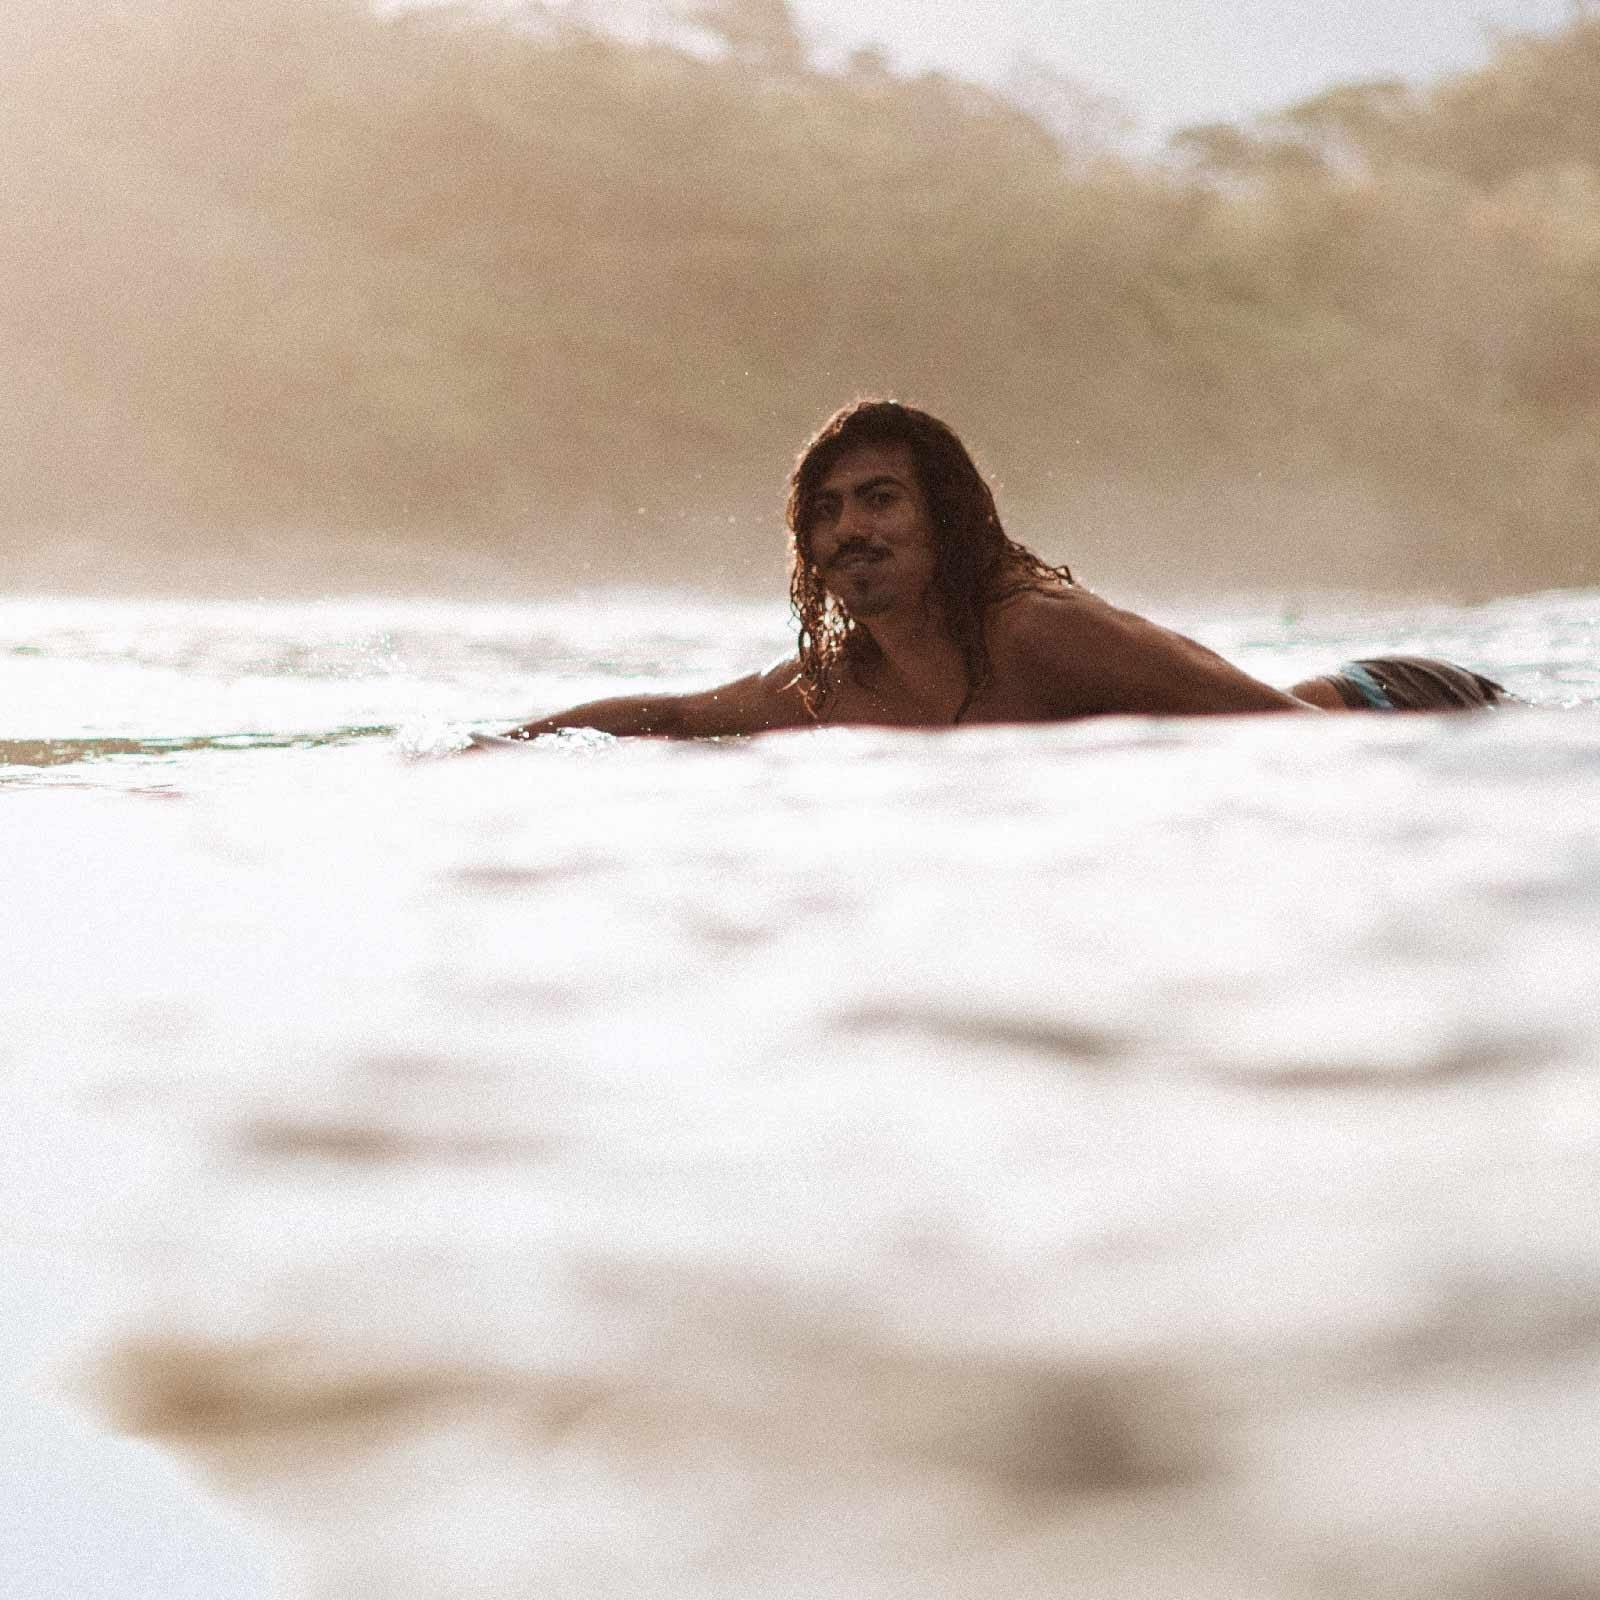 Moove surfer paddle